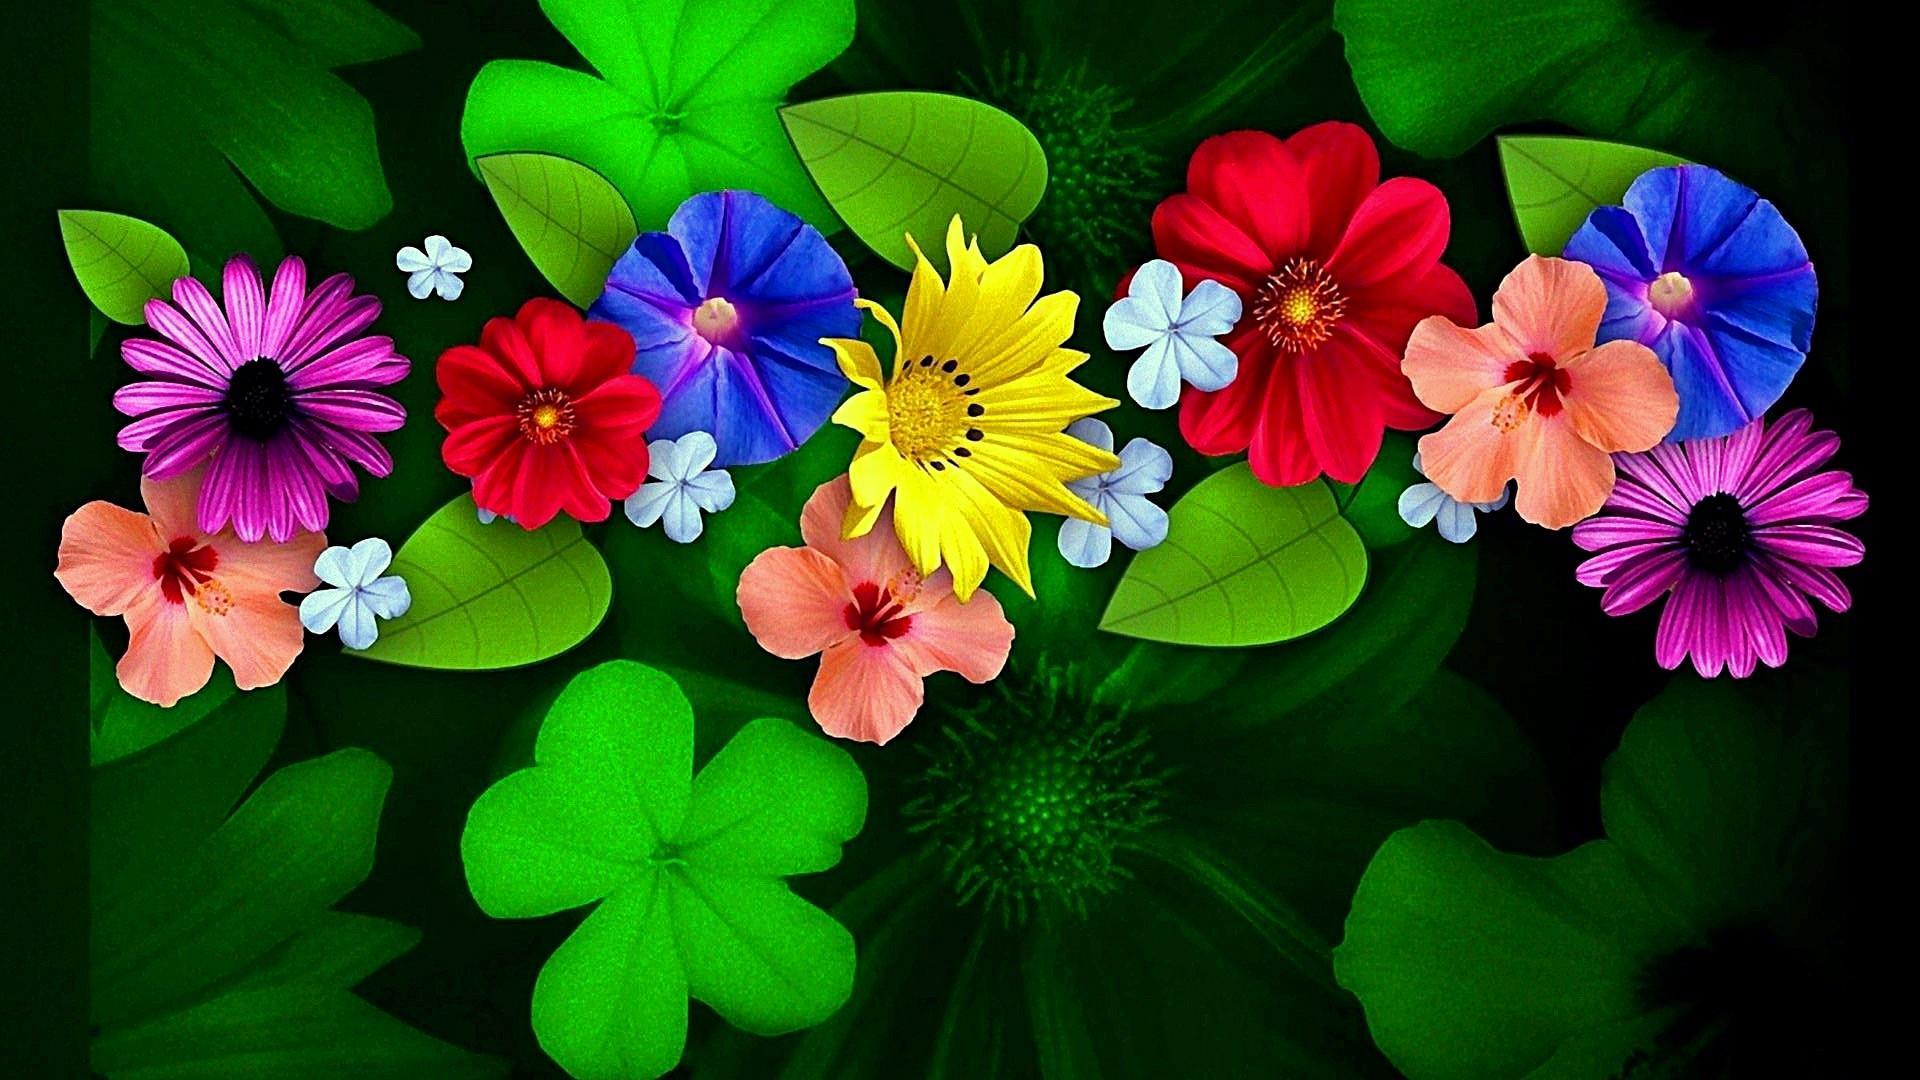 Wallpaper Hd Flowers Posted By Ethan Peltier